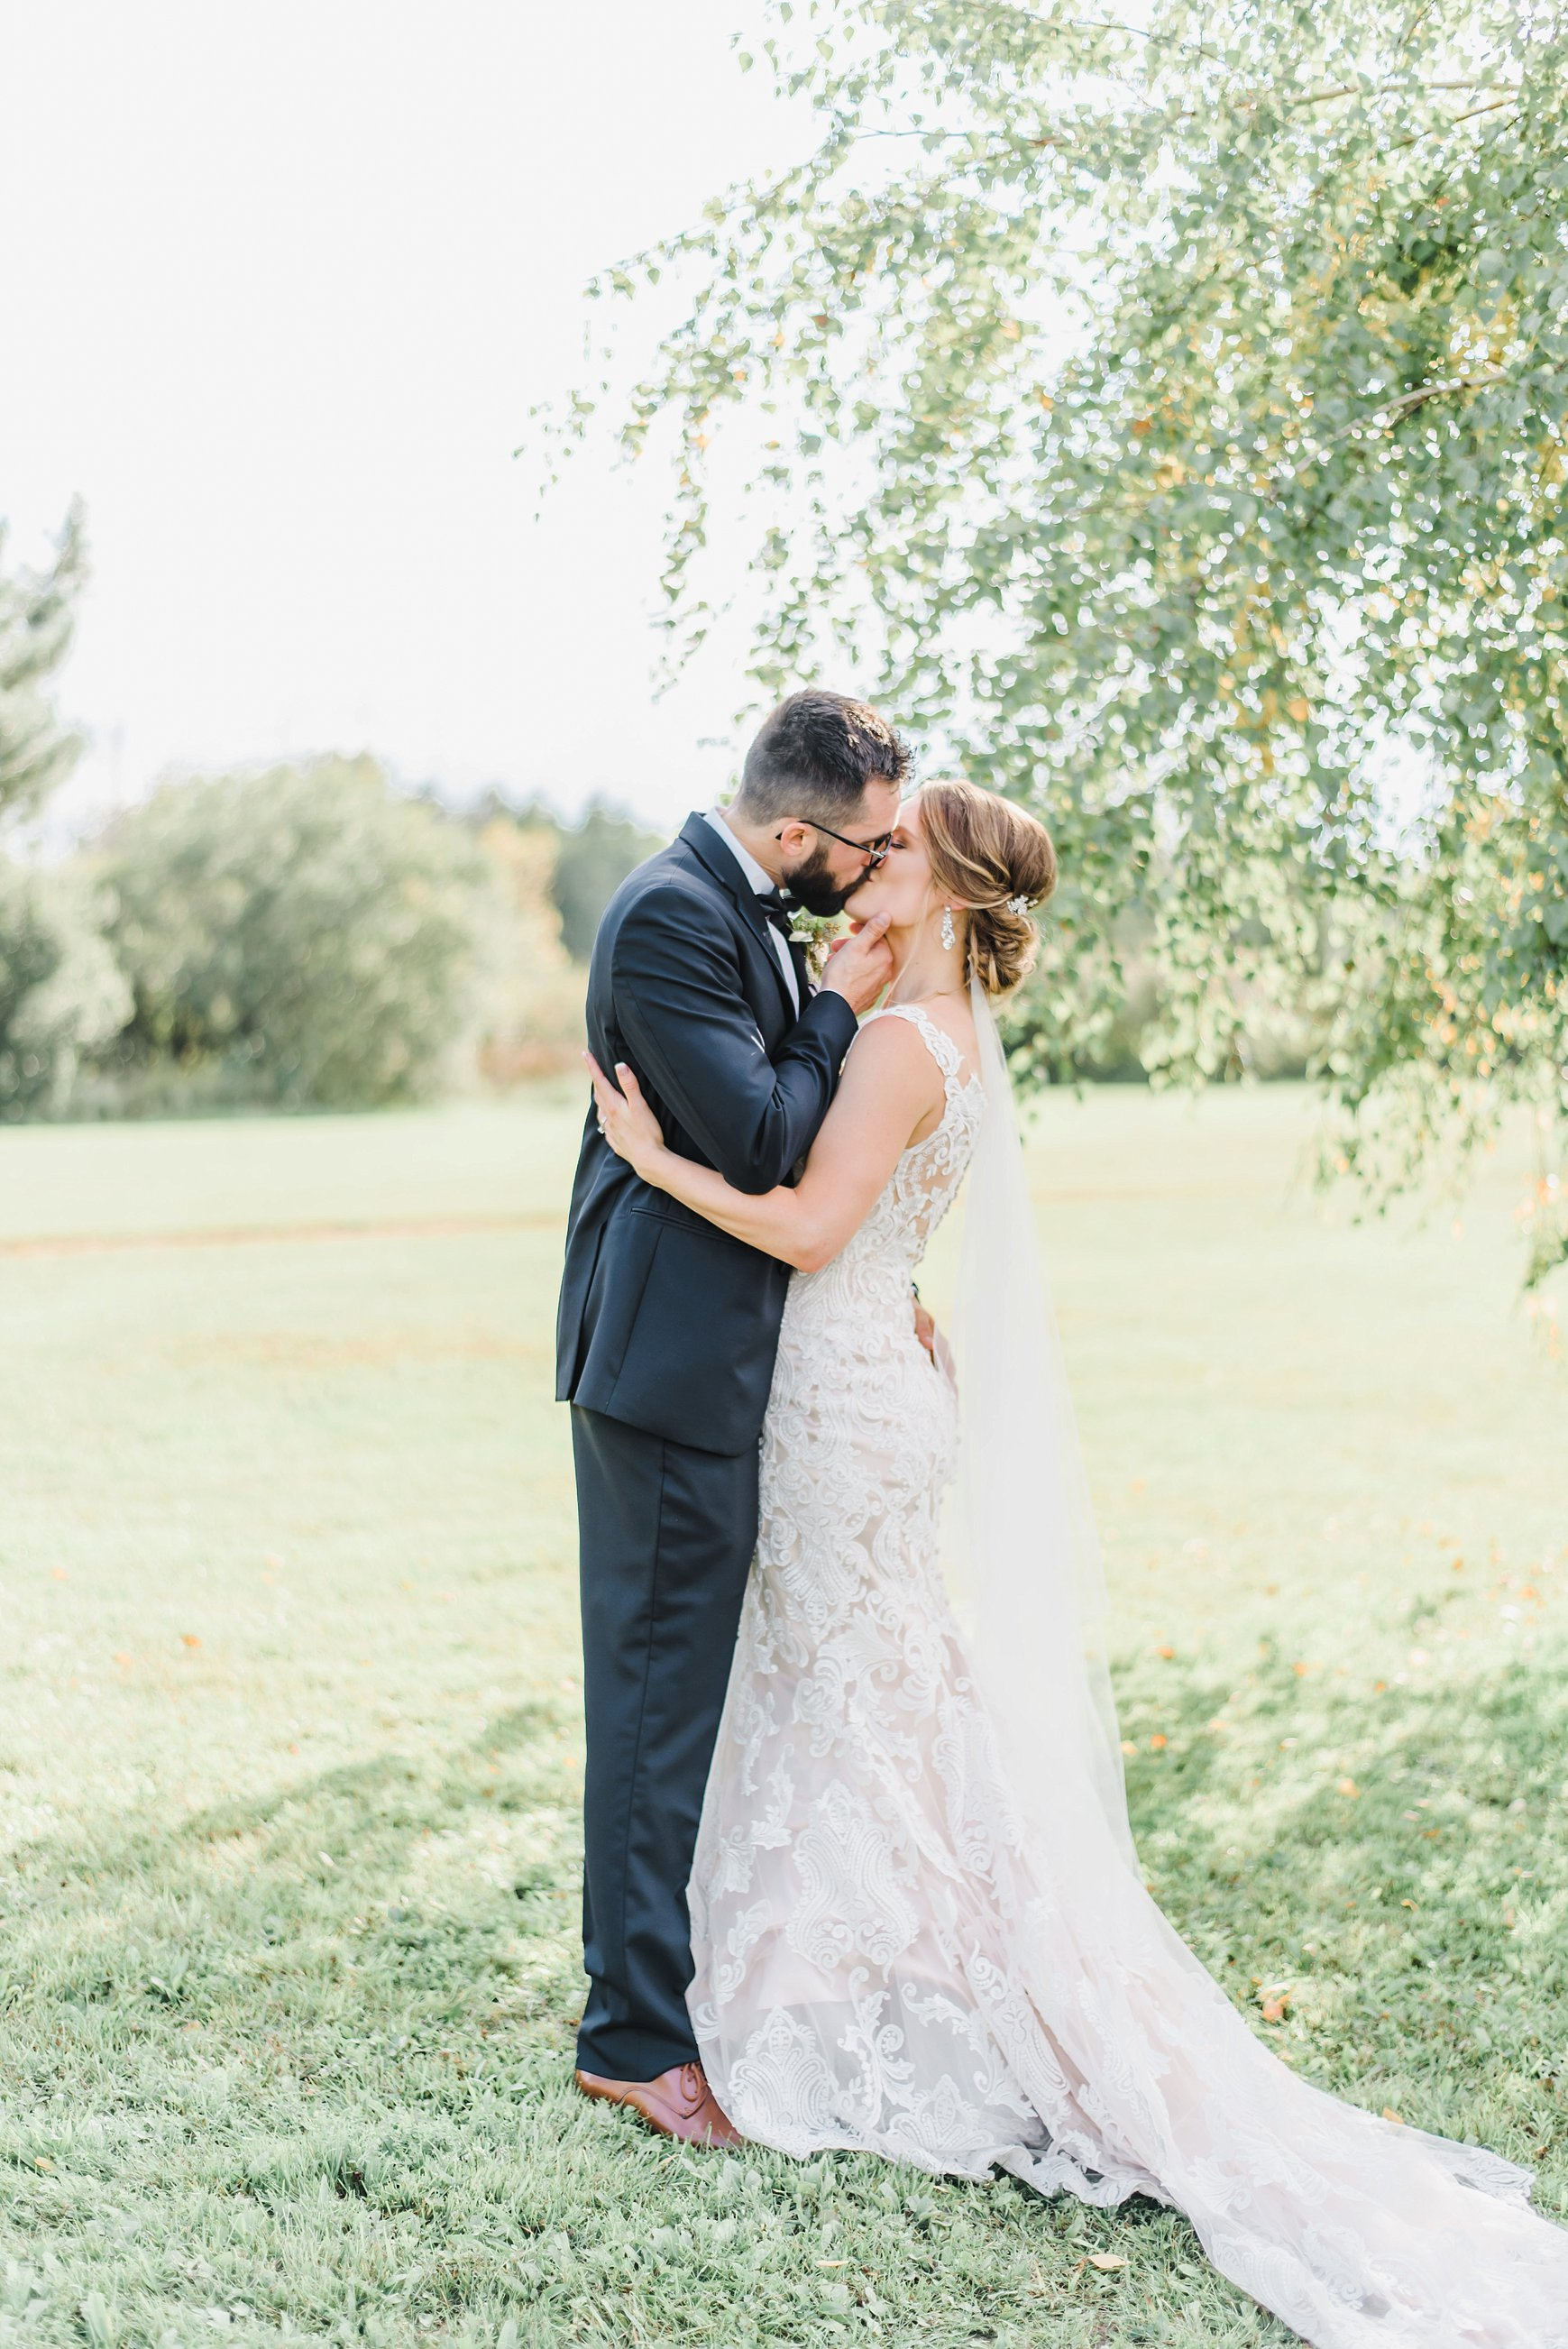 light airy indie fine art ottawa wedding photographer | Ali and Batoul Photography_1303.jpg